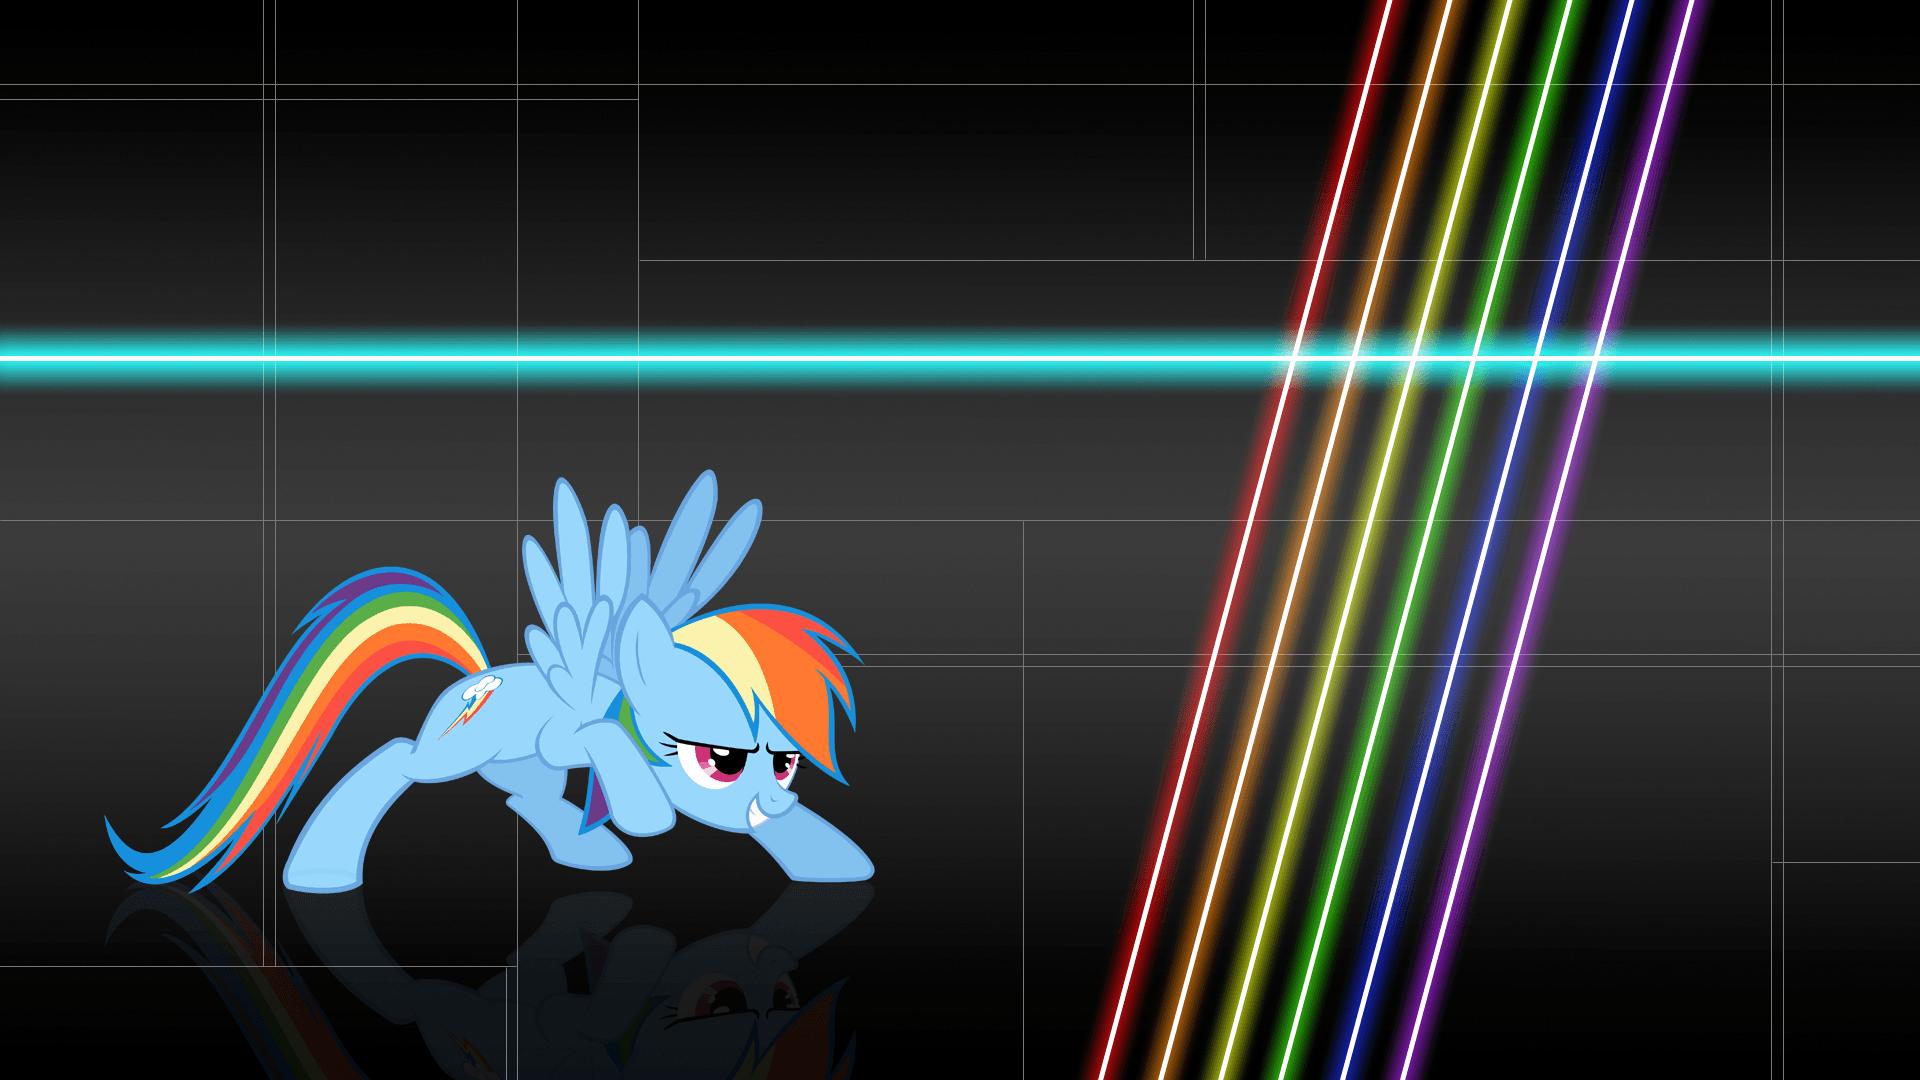 rainbow dash sphere background - photo #7